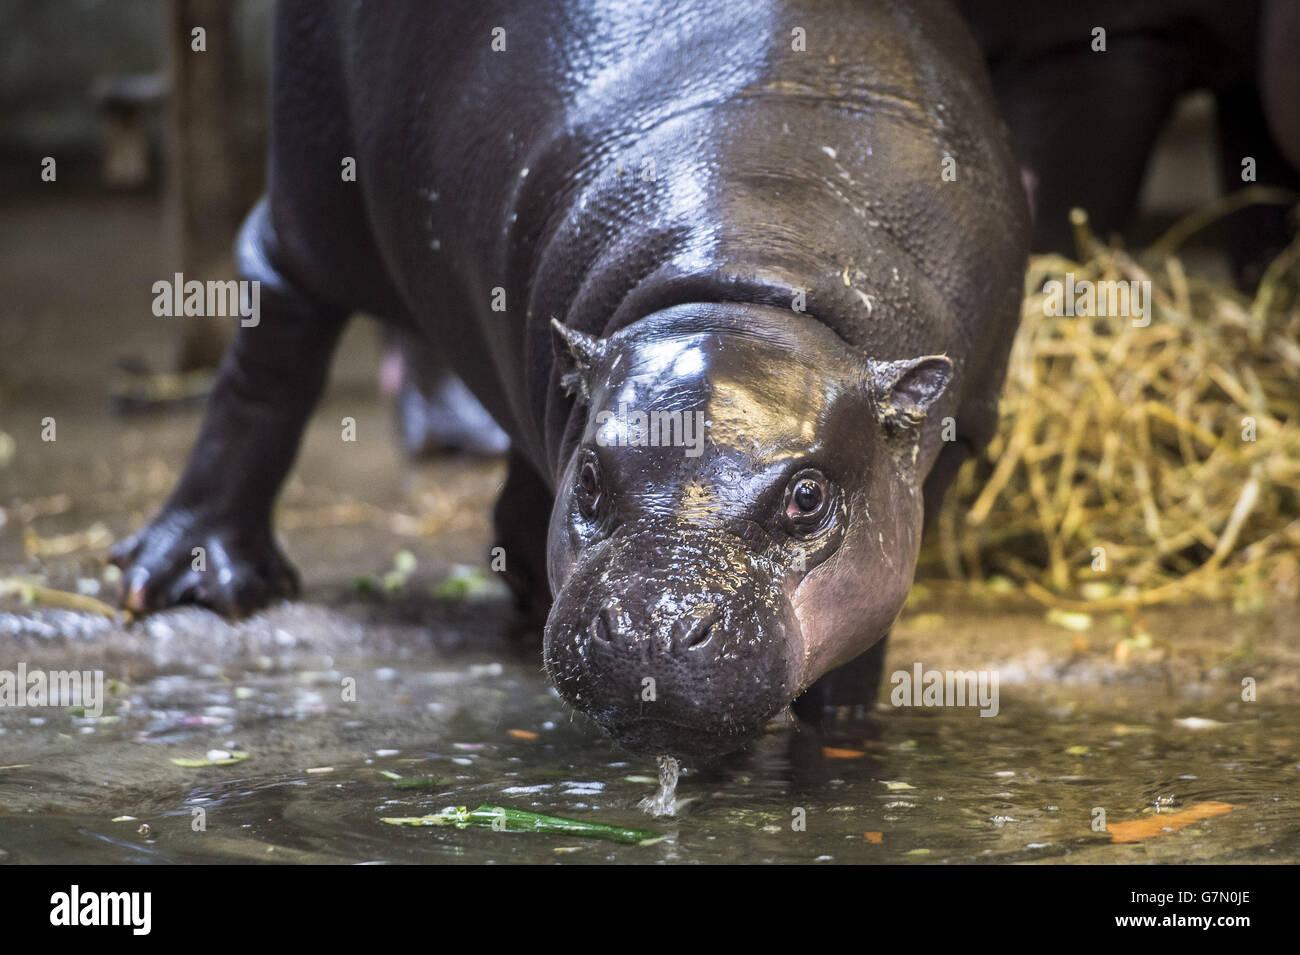 Hippo Birthday Cake Stock Photos Hippo Birthday Cake Stock Images